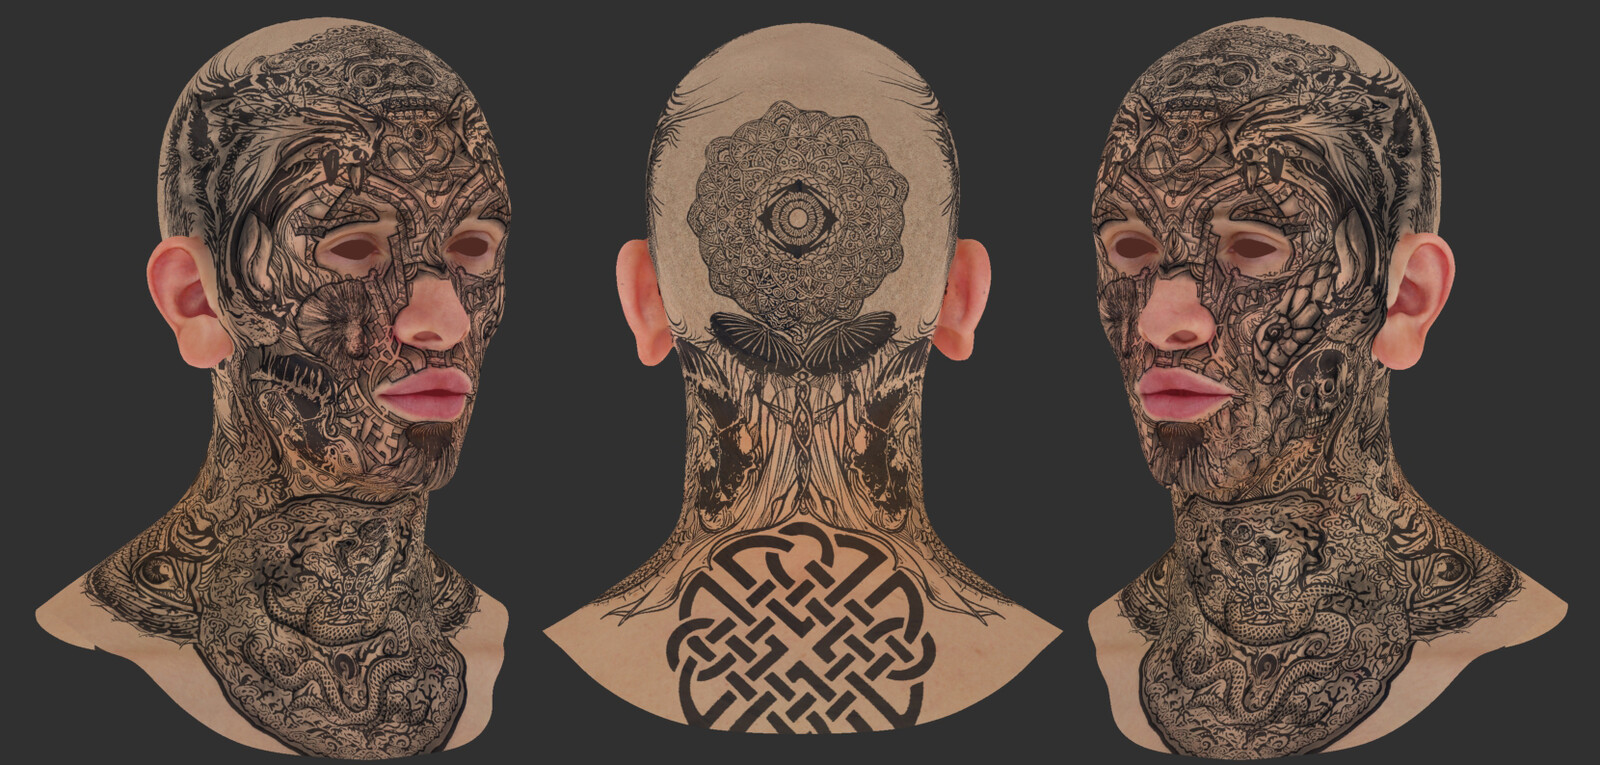 Albedo and tattoos design